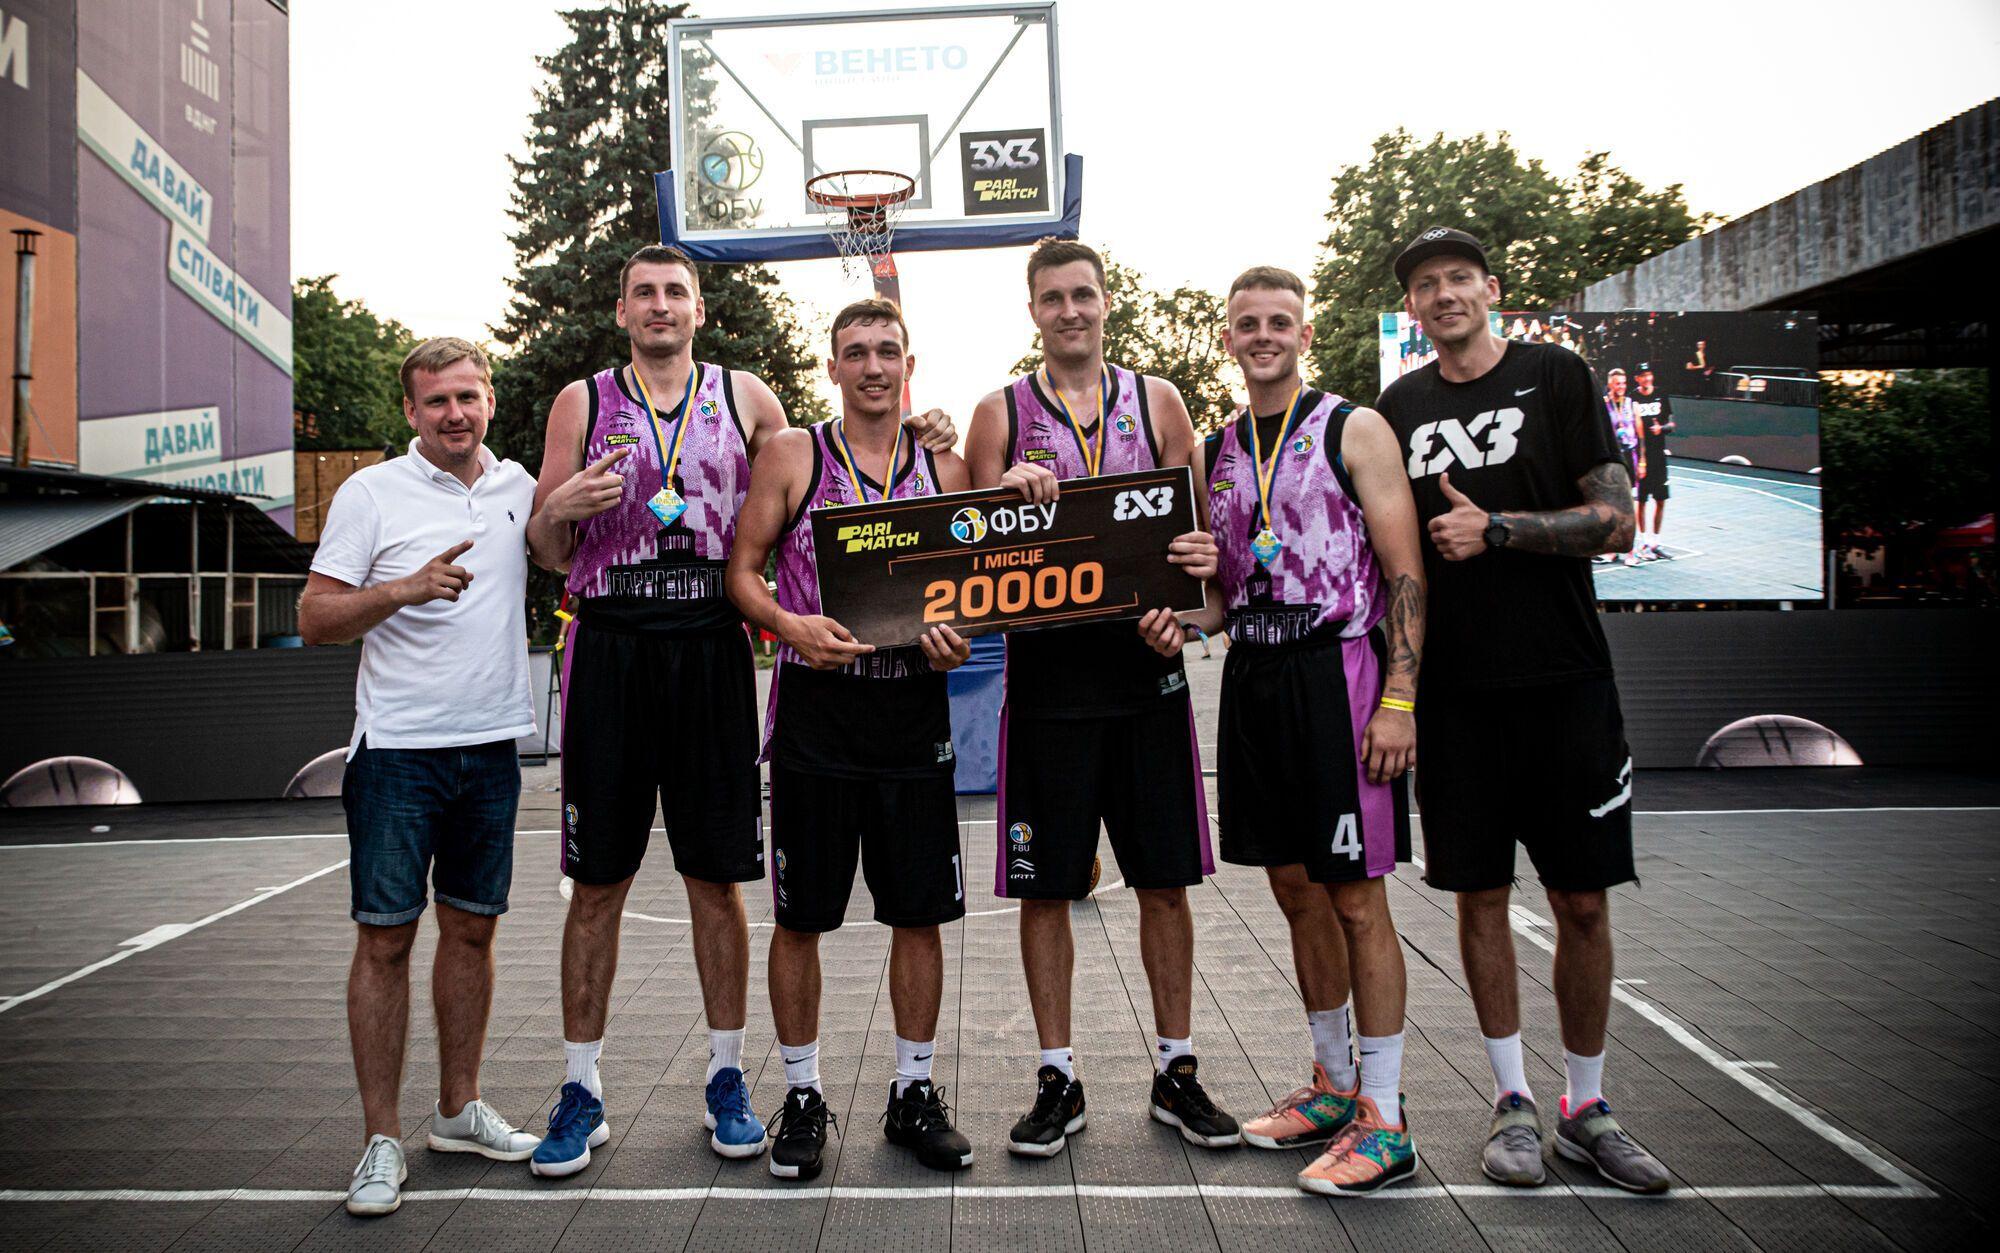 Определились победители 3-го тура чемпионата Украины по баскетболу 3х3